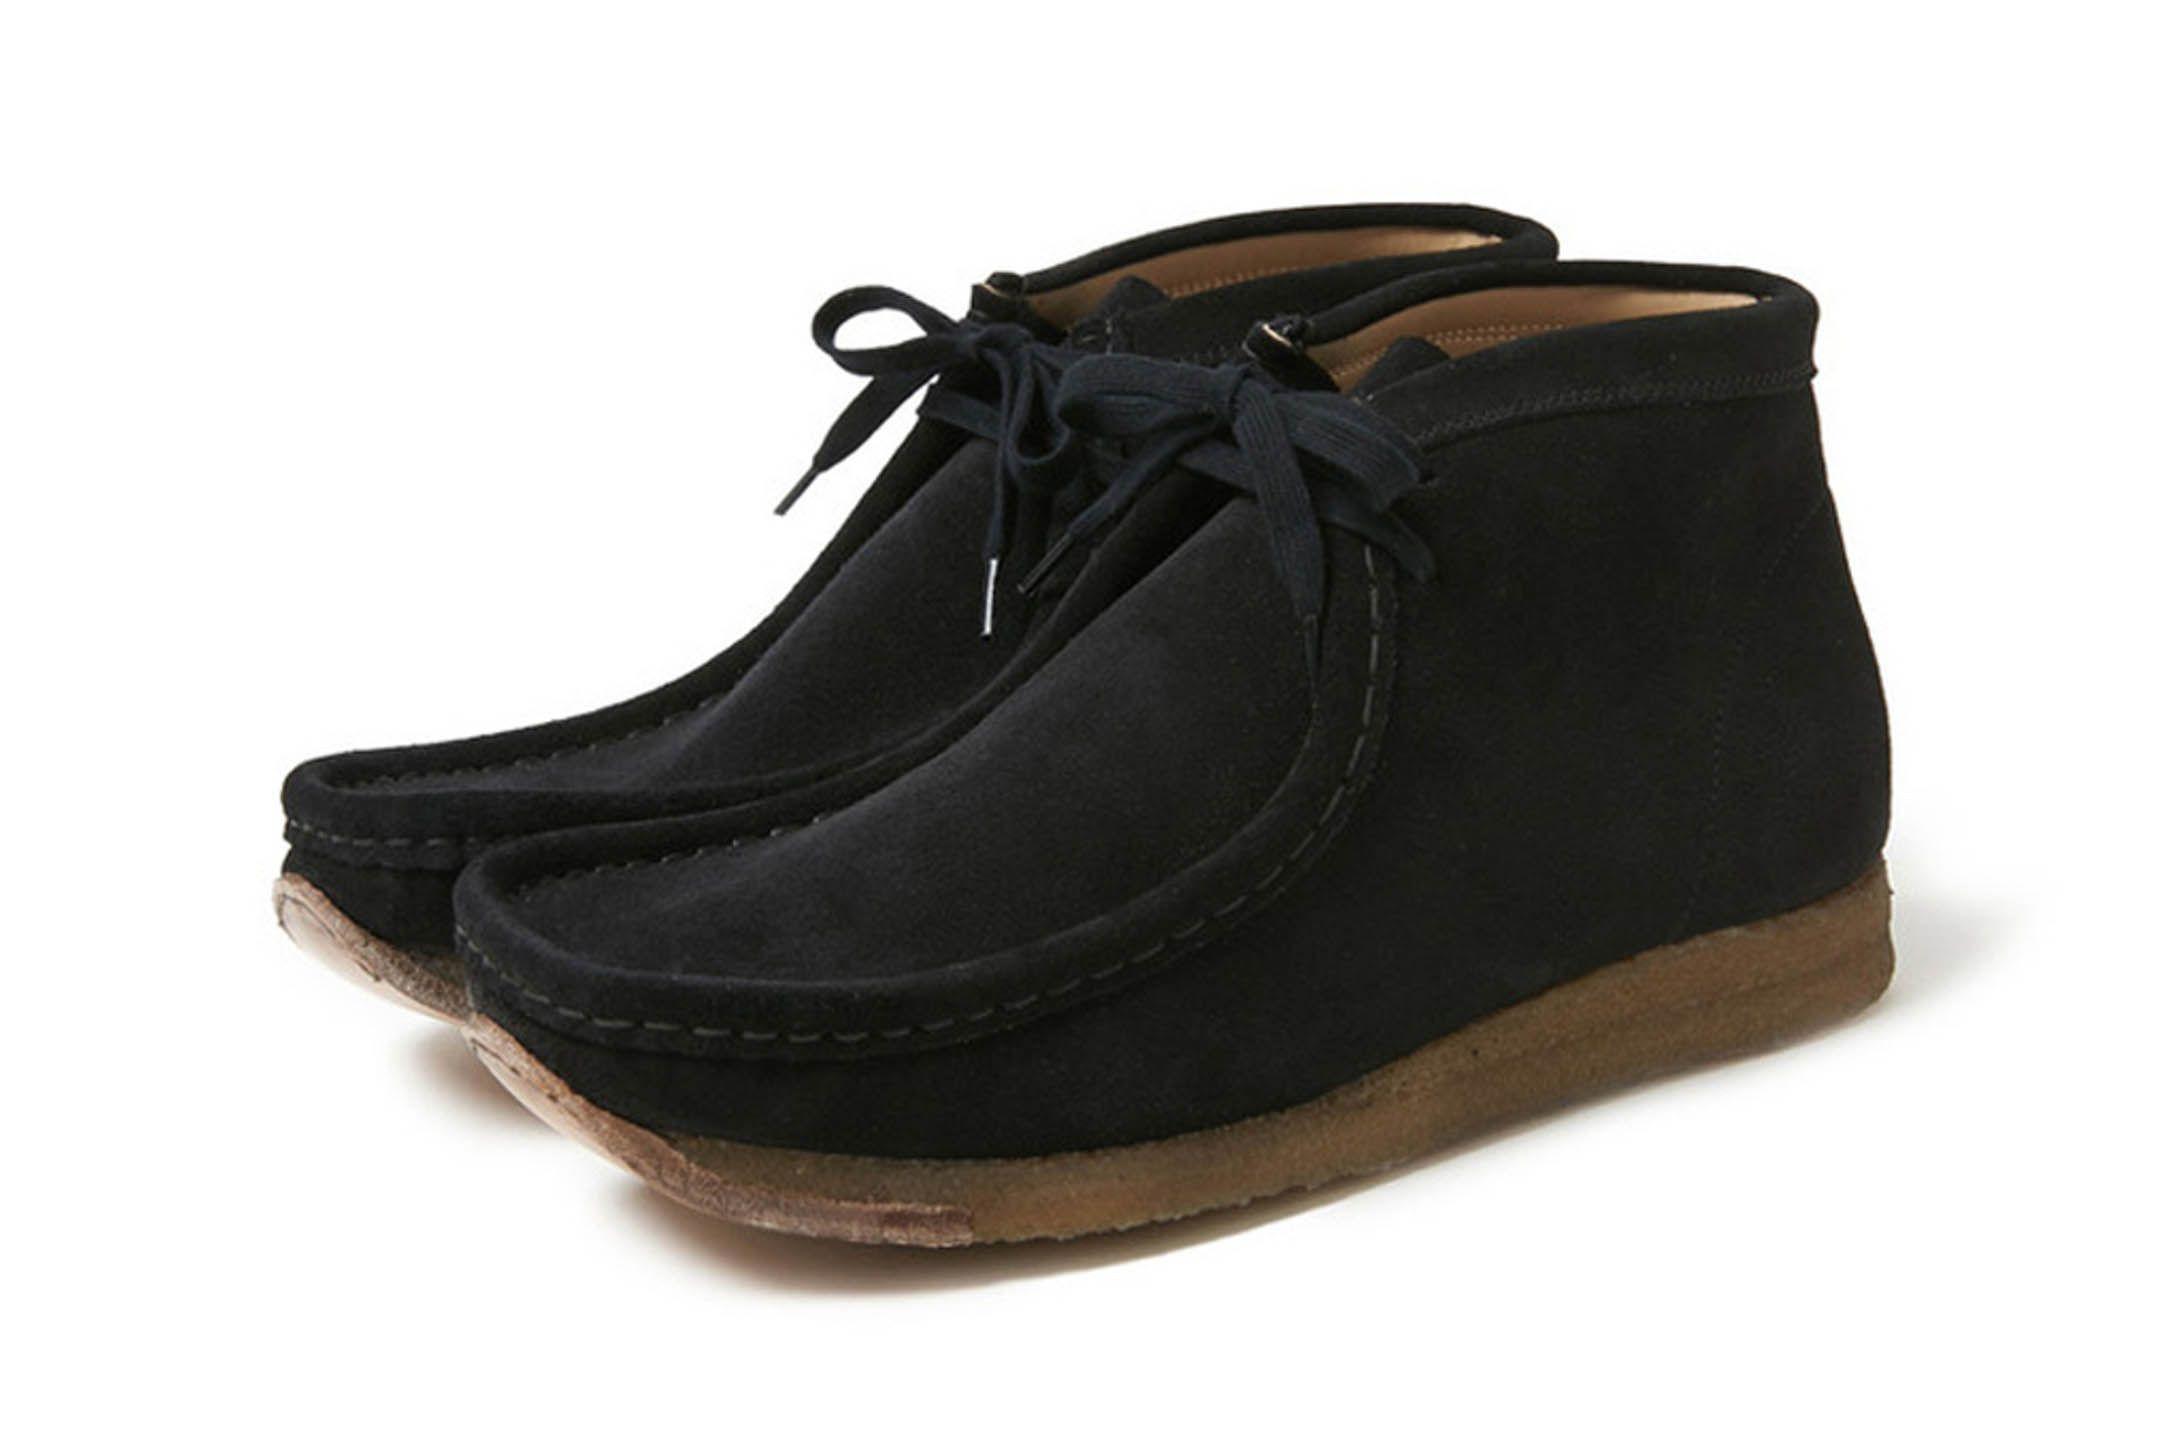 Nonnative Spring Summer 2018 Footwear Collection 4 Sneaker Freaker